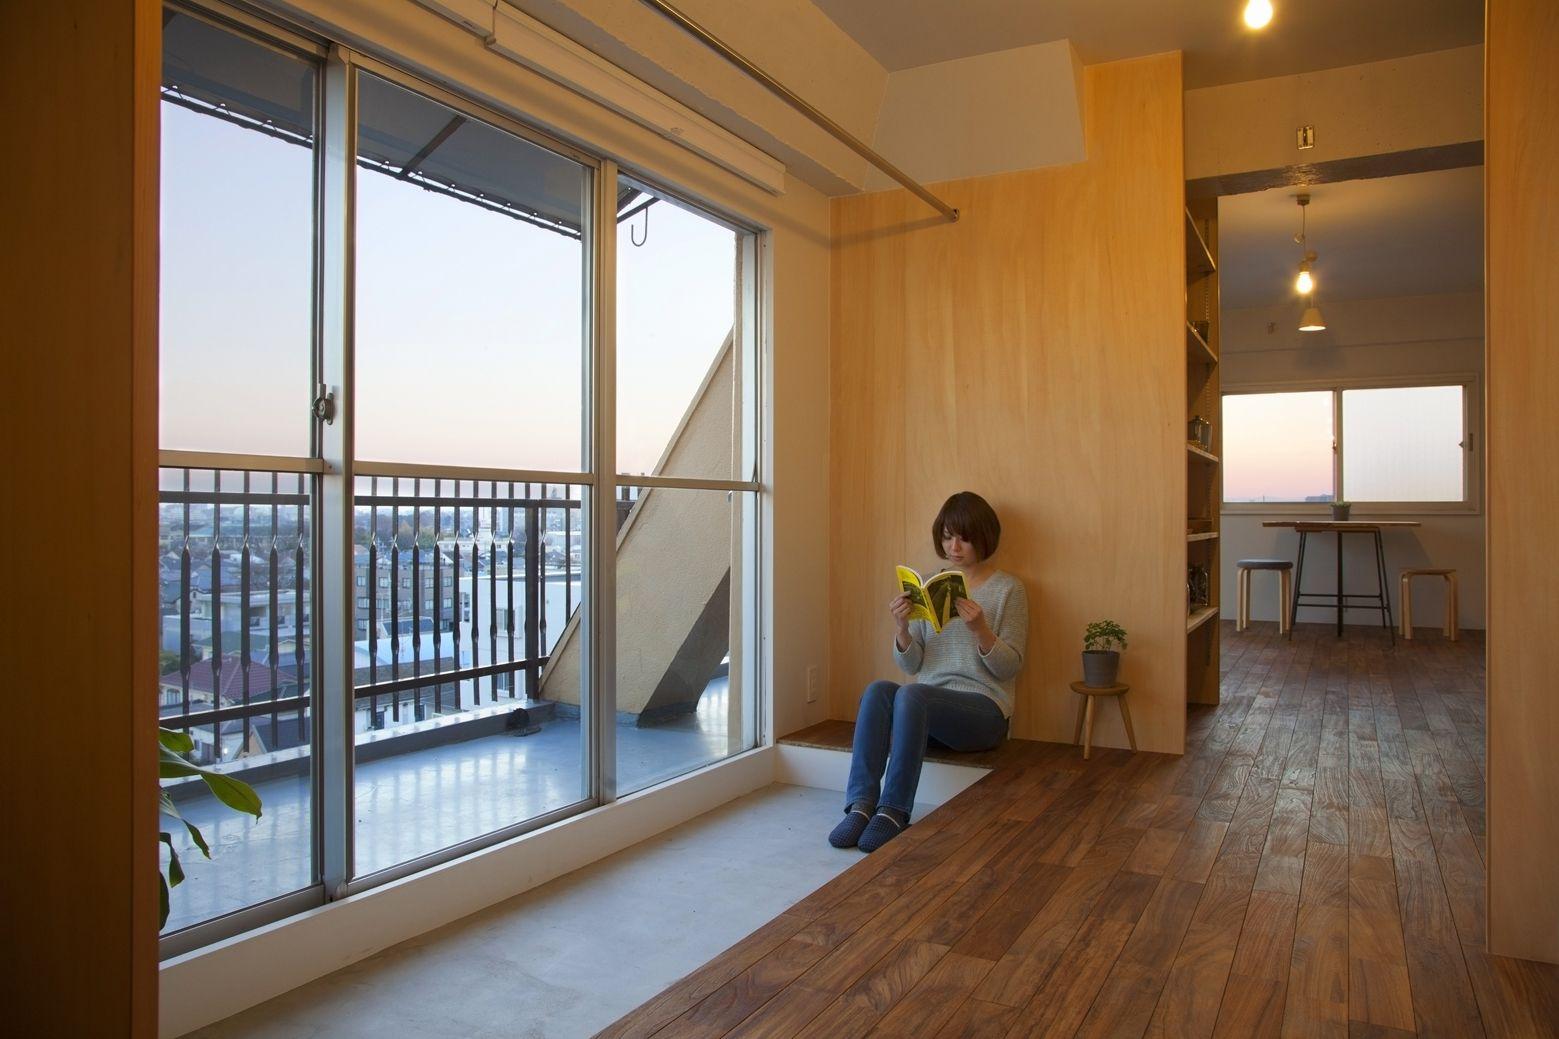 Wing Wall House  Camp Design Inc  Sumosaga Fudosan  Tokyo Japan Delectable Japanese Living Room Design Inspiration